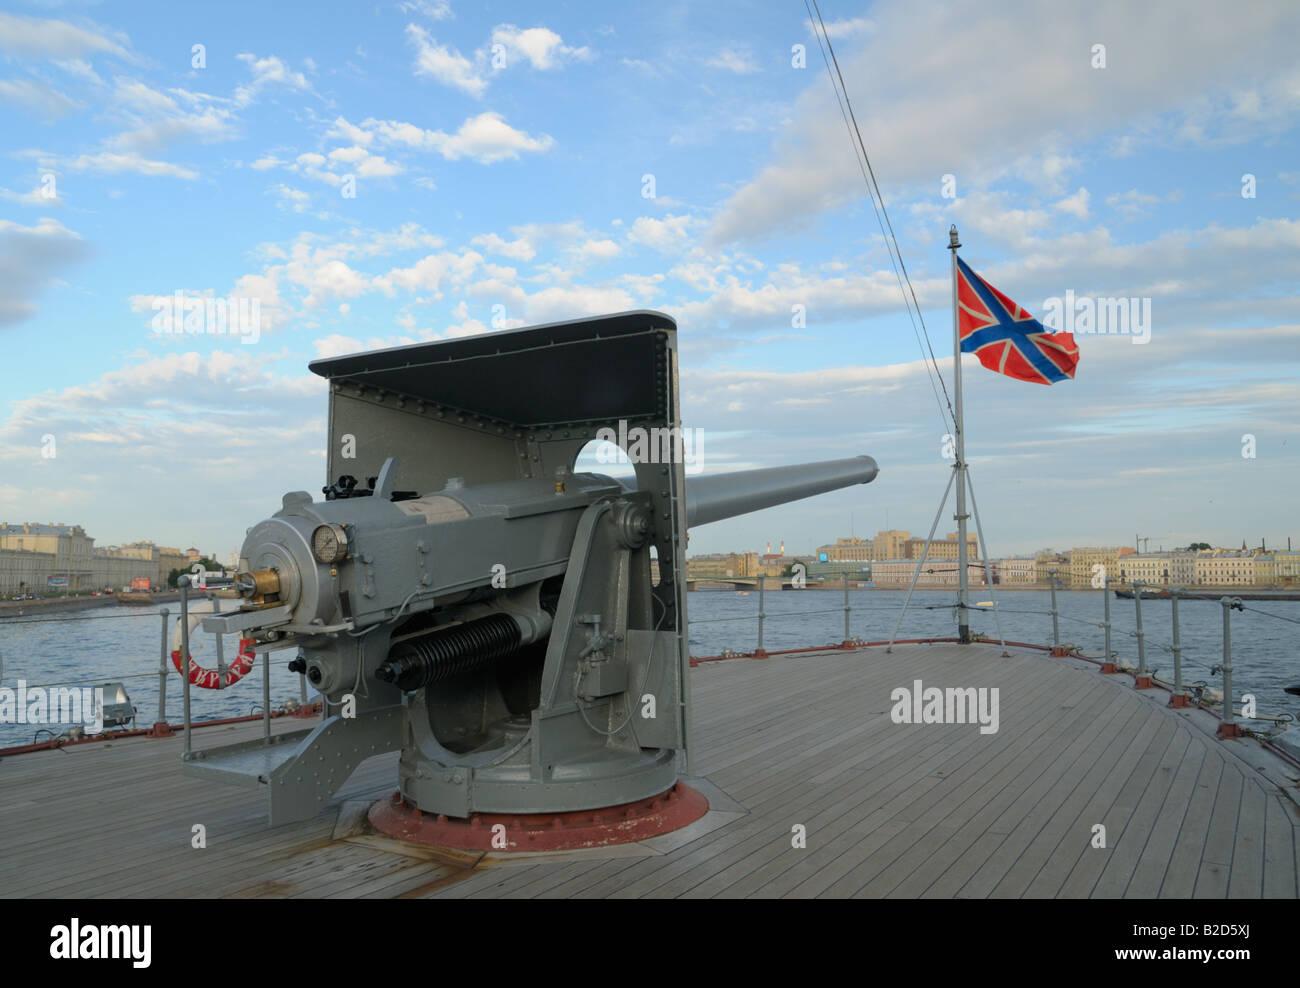 Bismarck 1/700 Meng - Page 2 Gun-of-aurora-cruiser-st-petersburg-russia-B2D5XJ